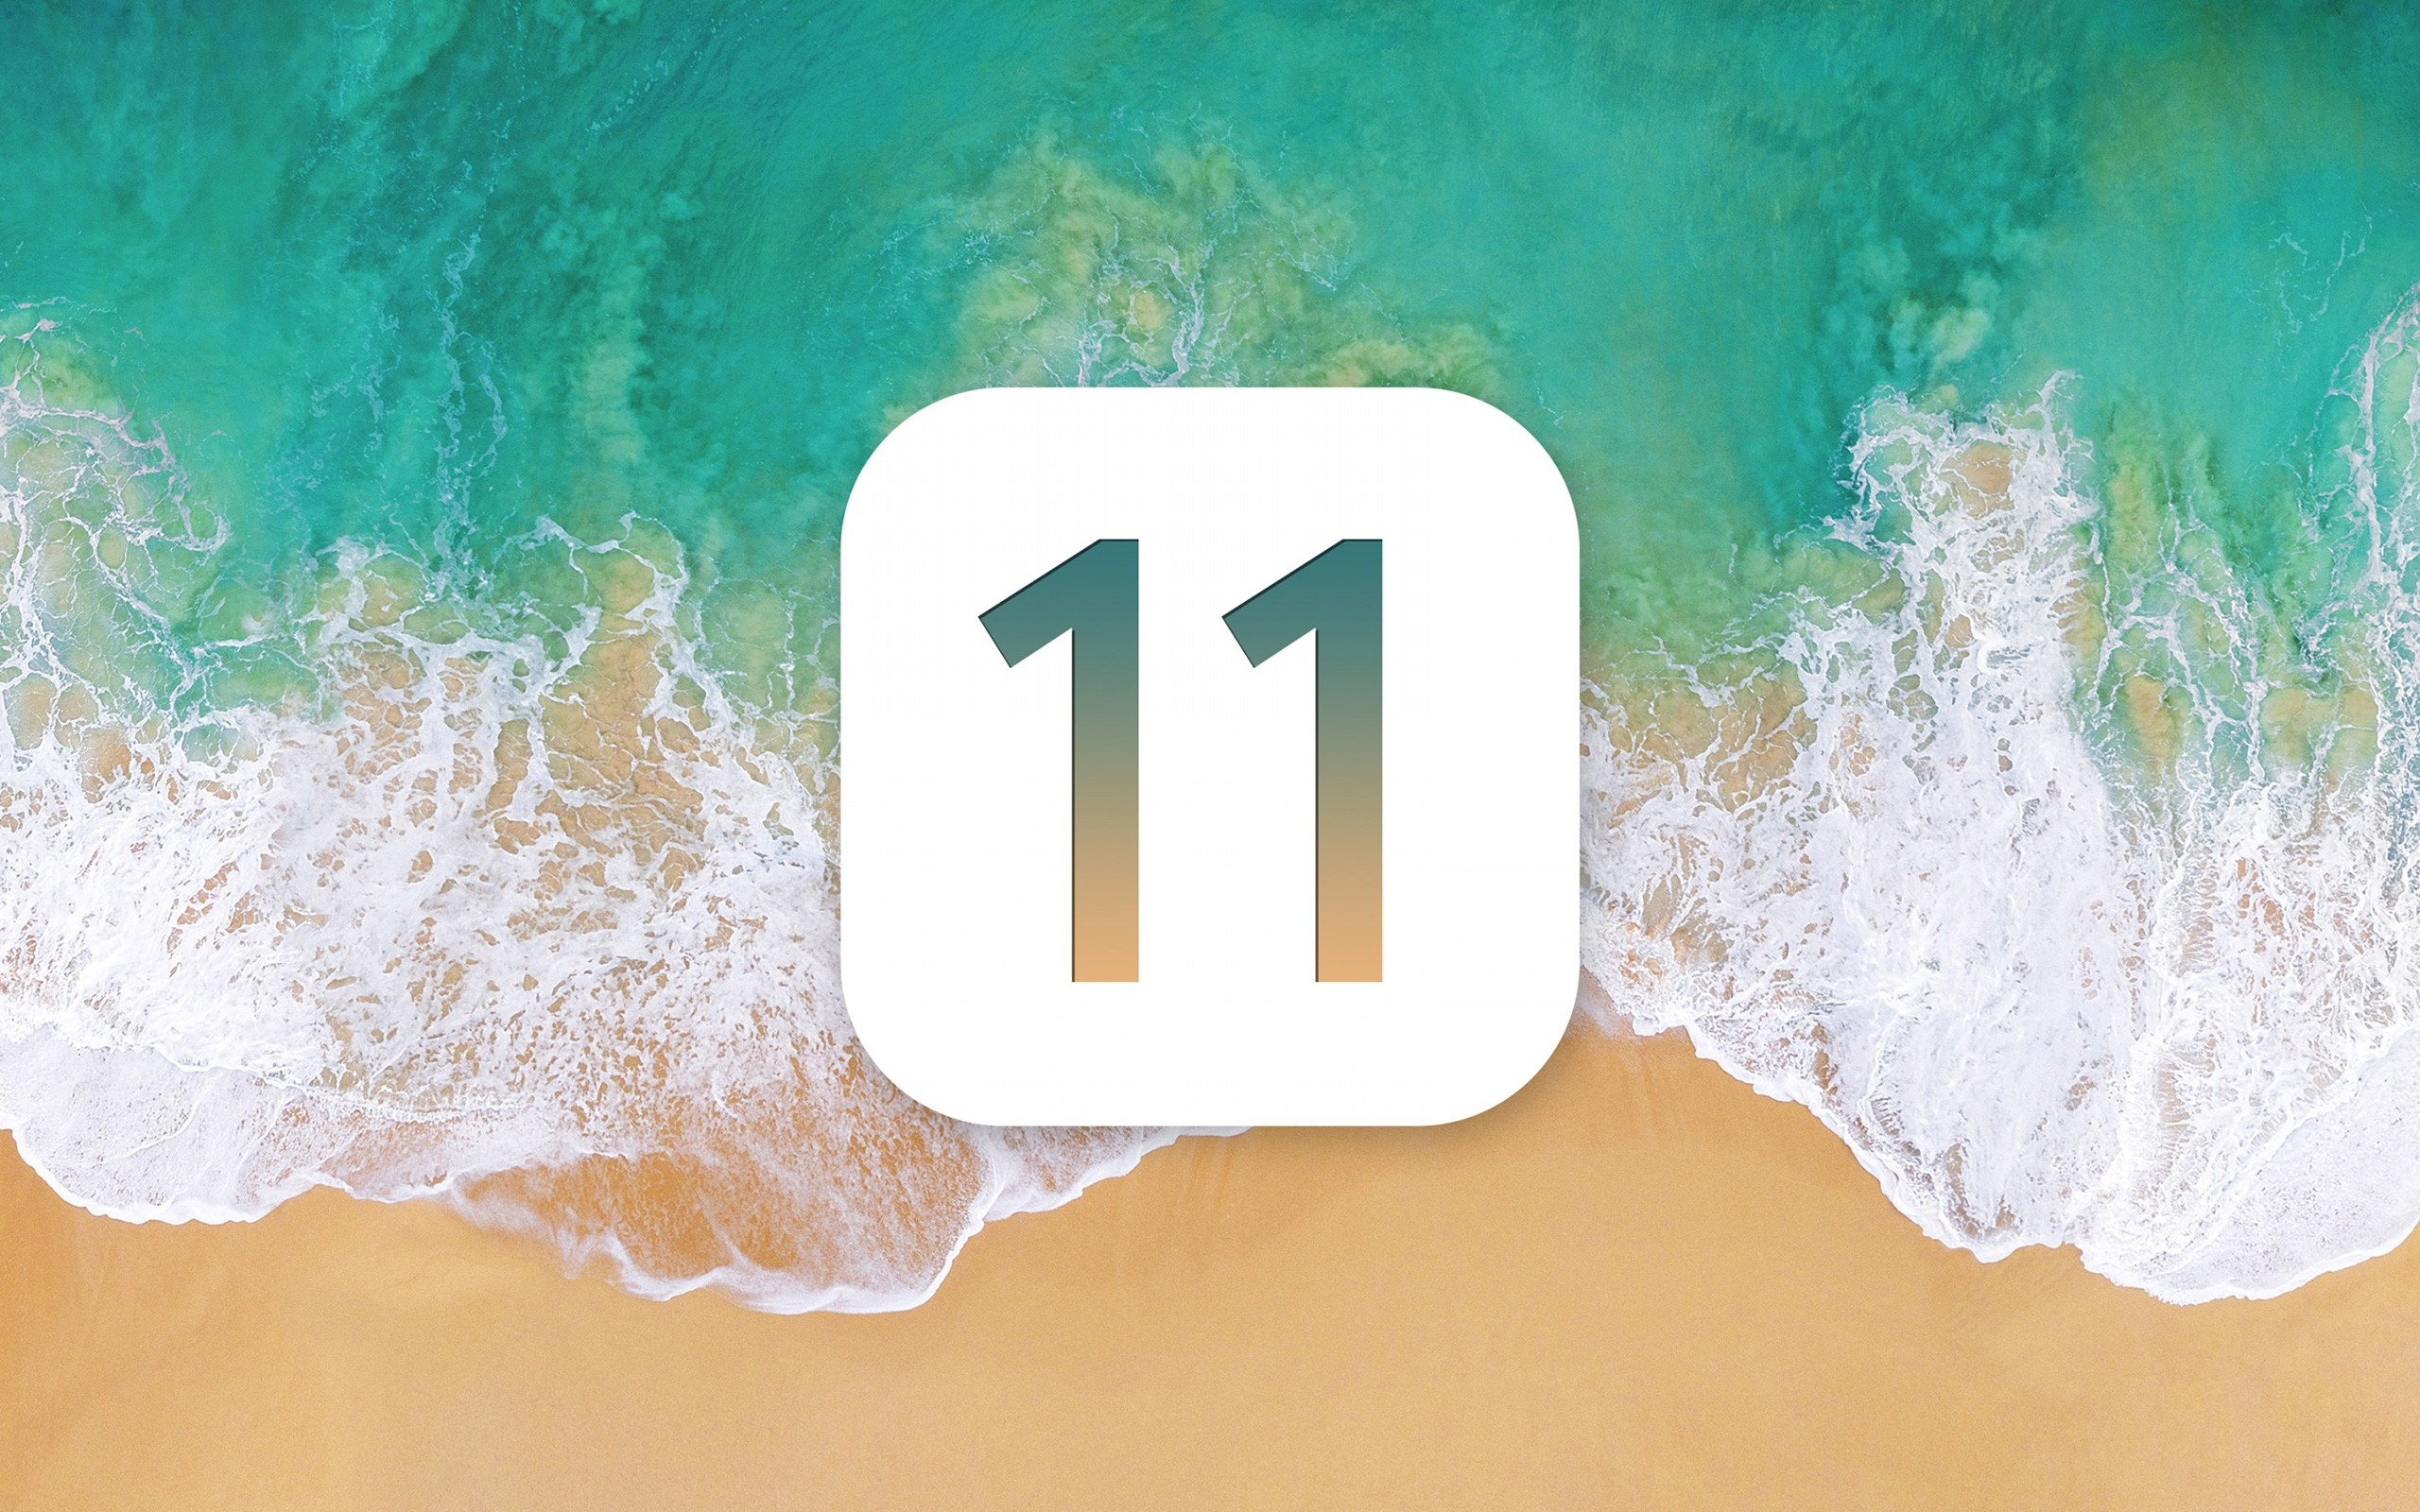 Beach Waves Apple Ios 11 Iphone 8 Iphone X Hd Wallpaper Preview 10wallpaper Com